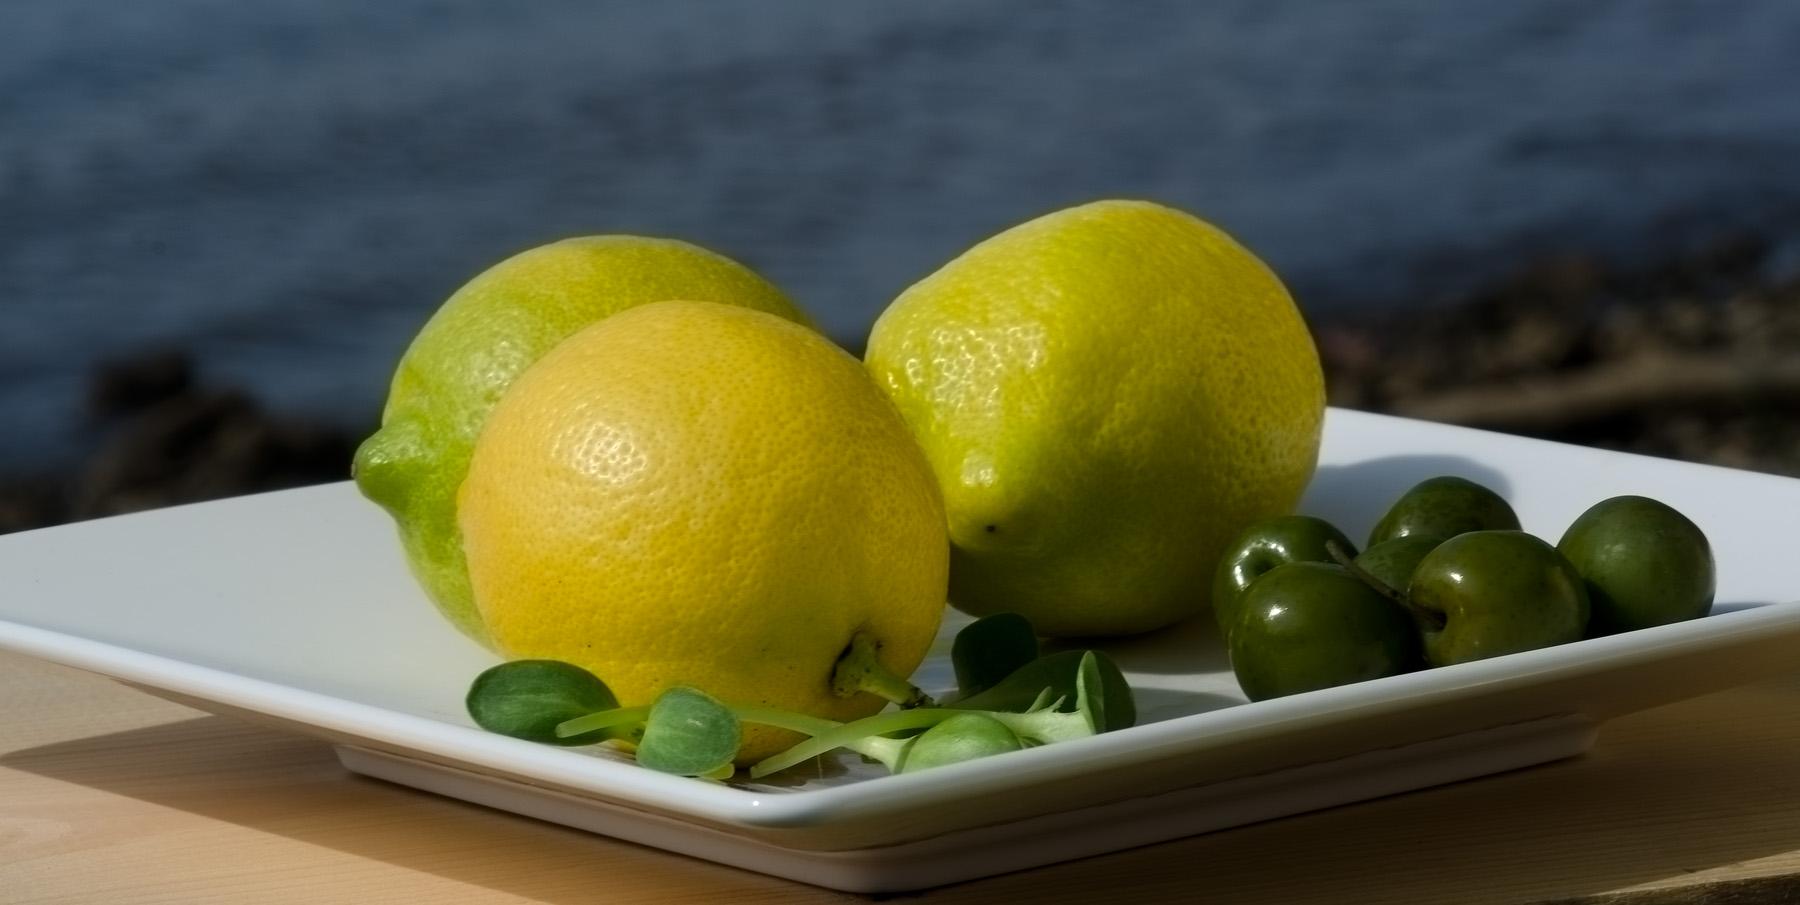 Lemons and Olives - image by Lisa Missenda